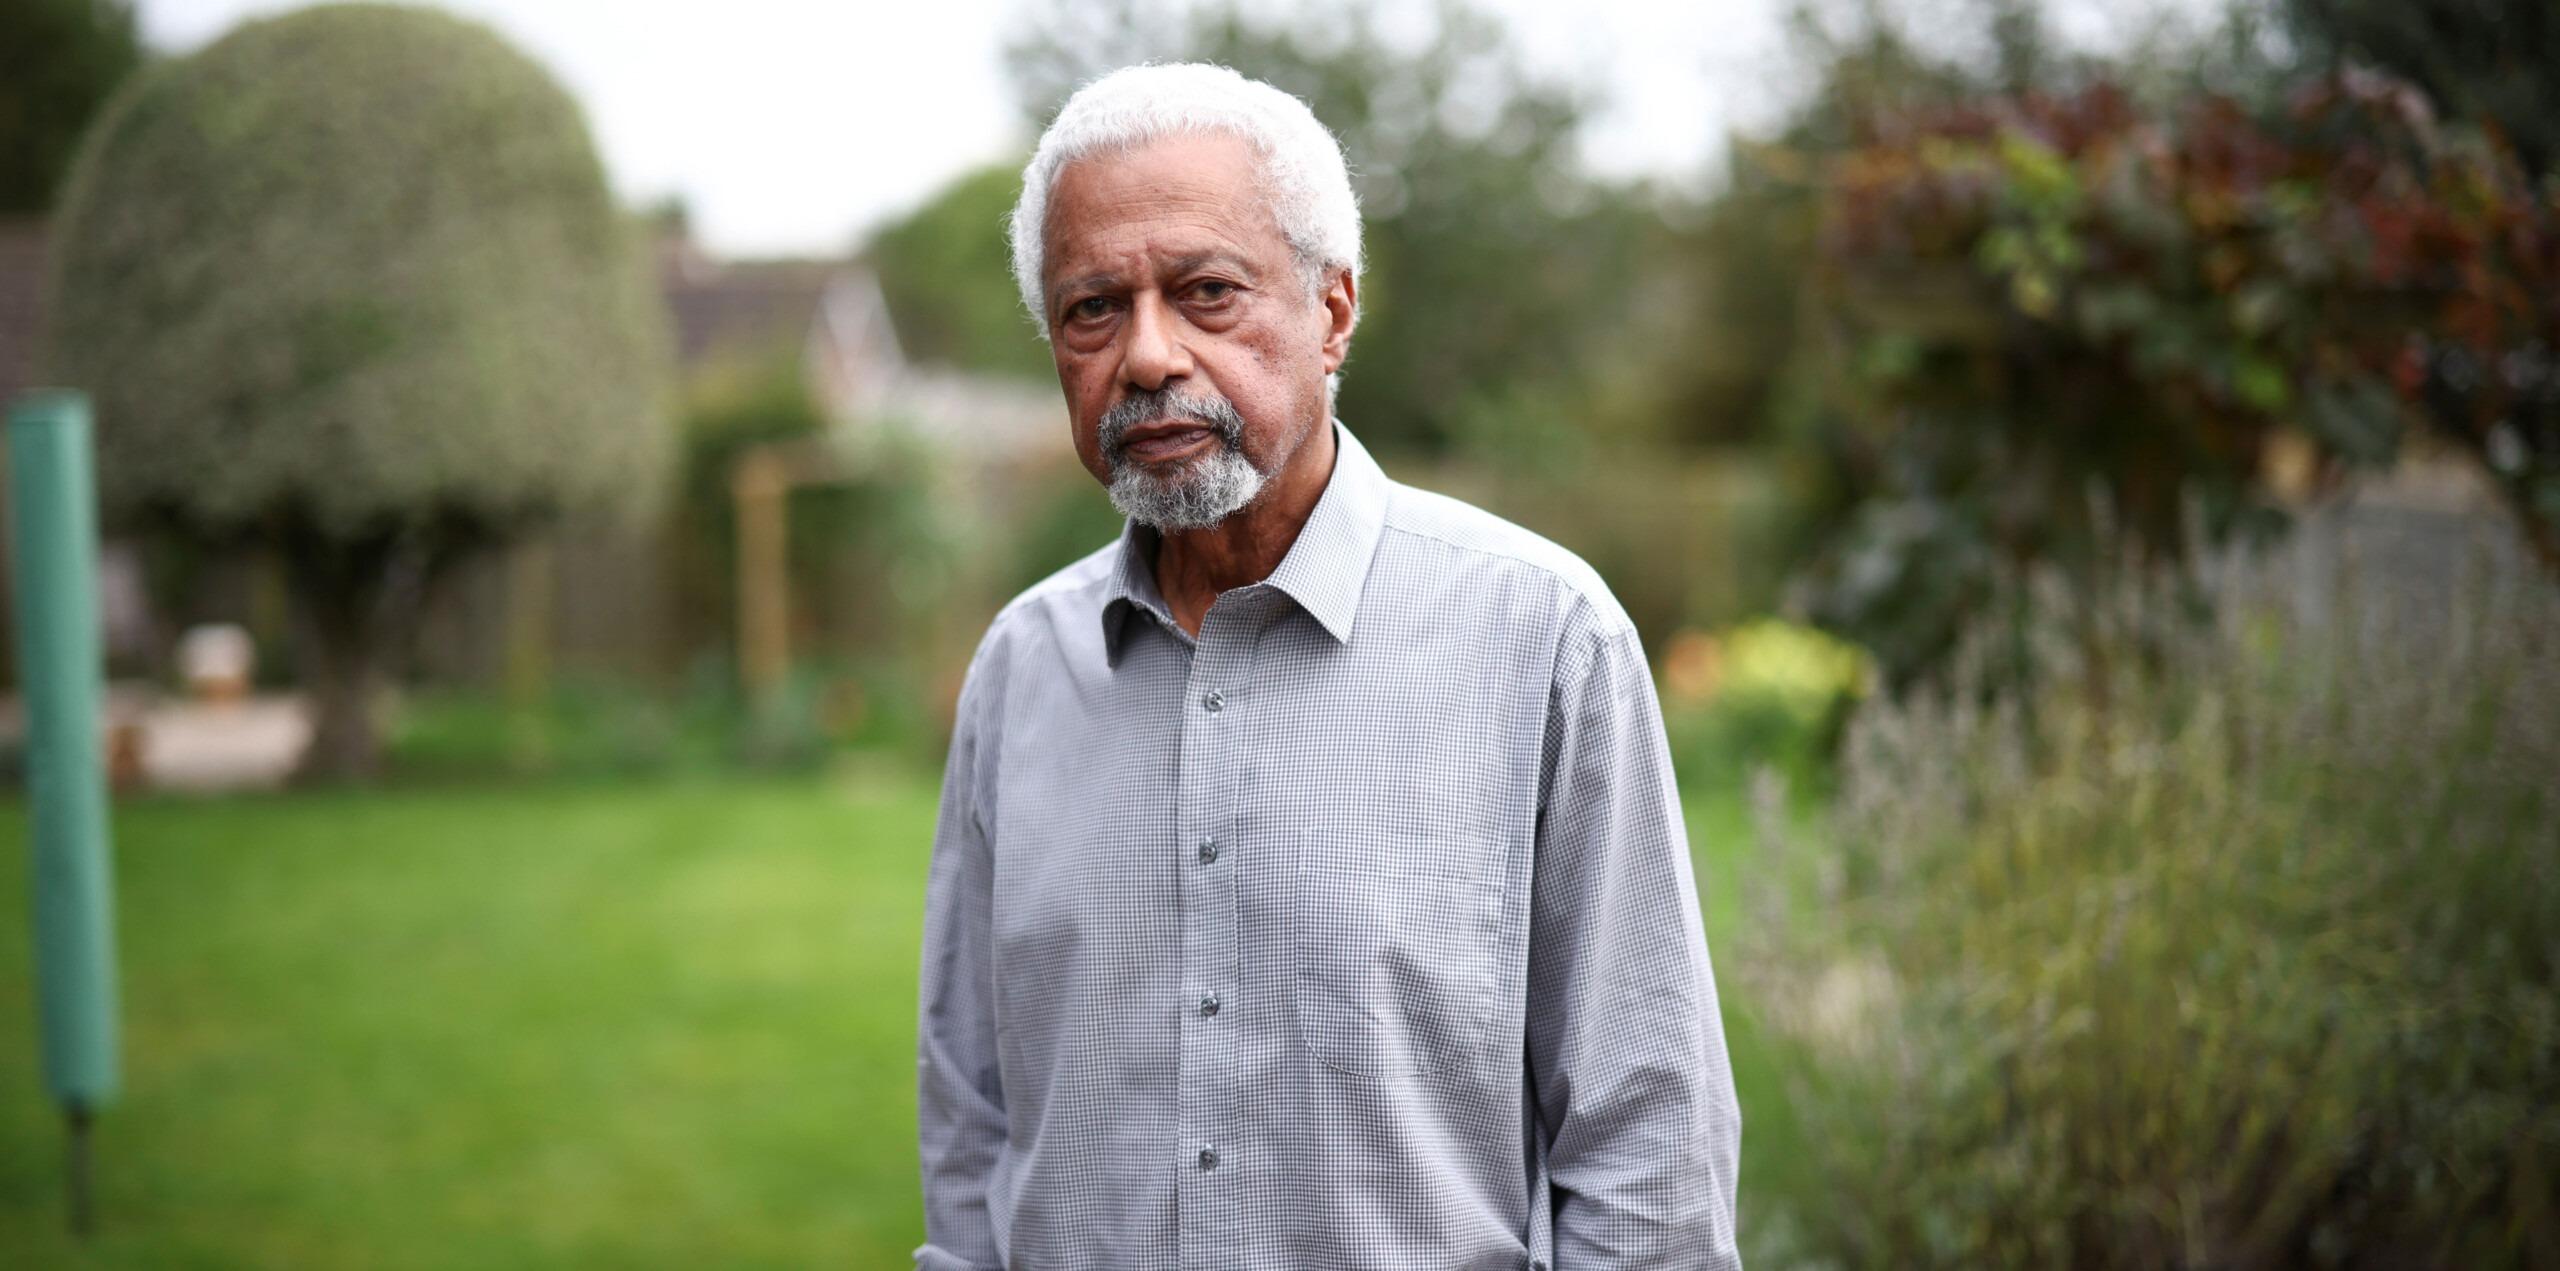 Abdulrazak Gurnah narrar la resistencia migrante – Gatopardo